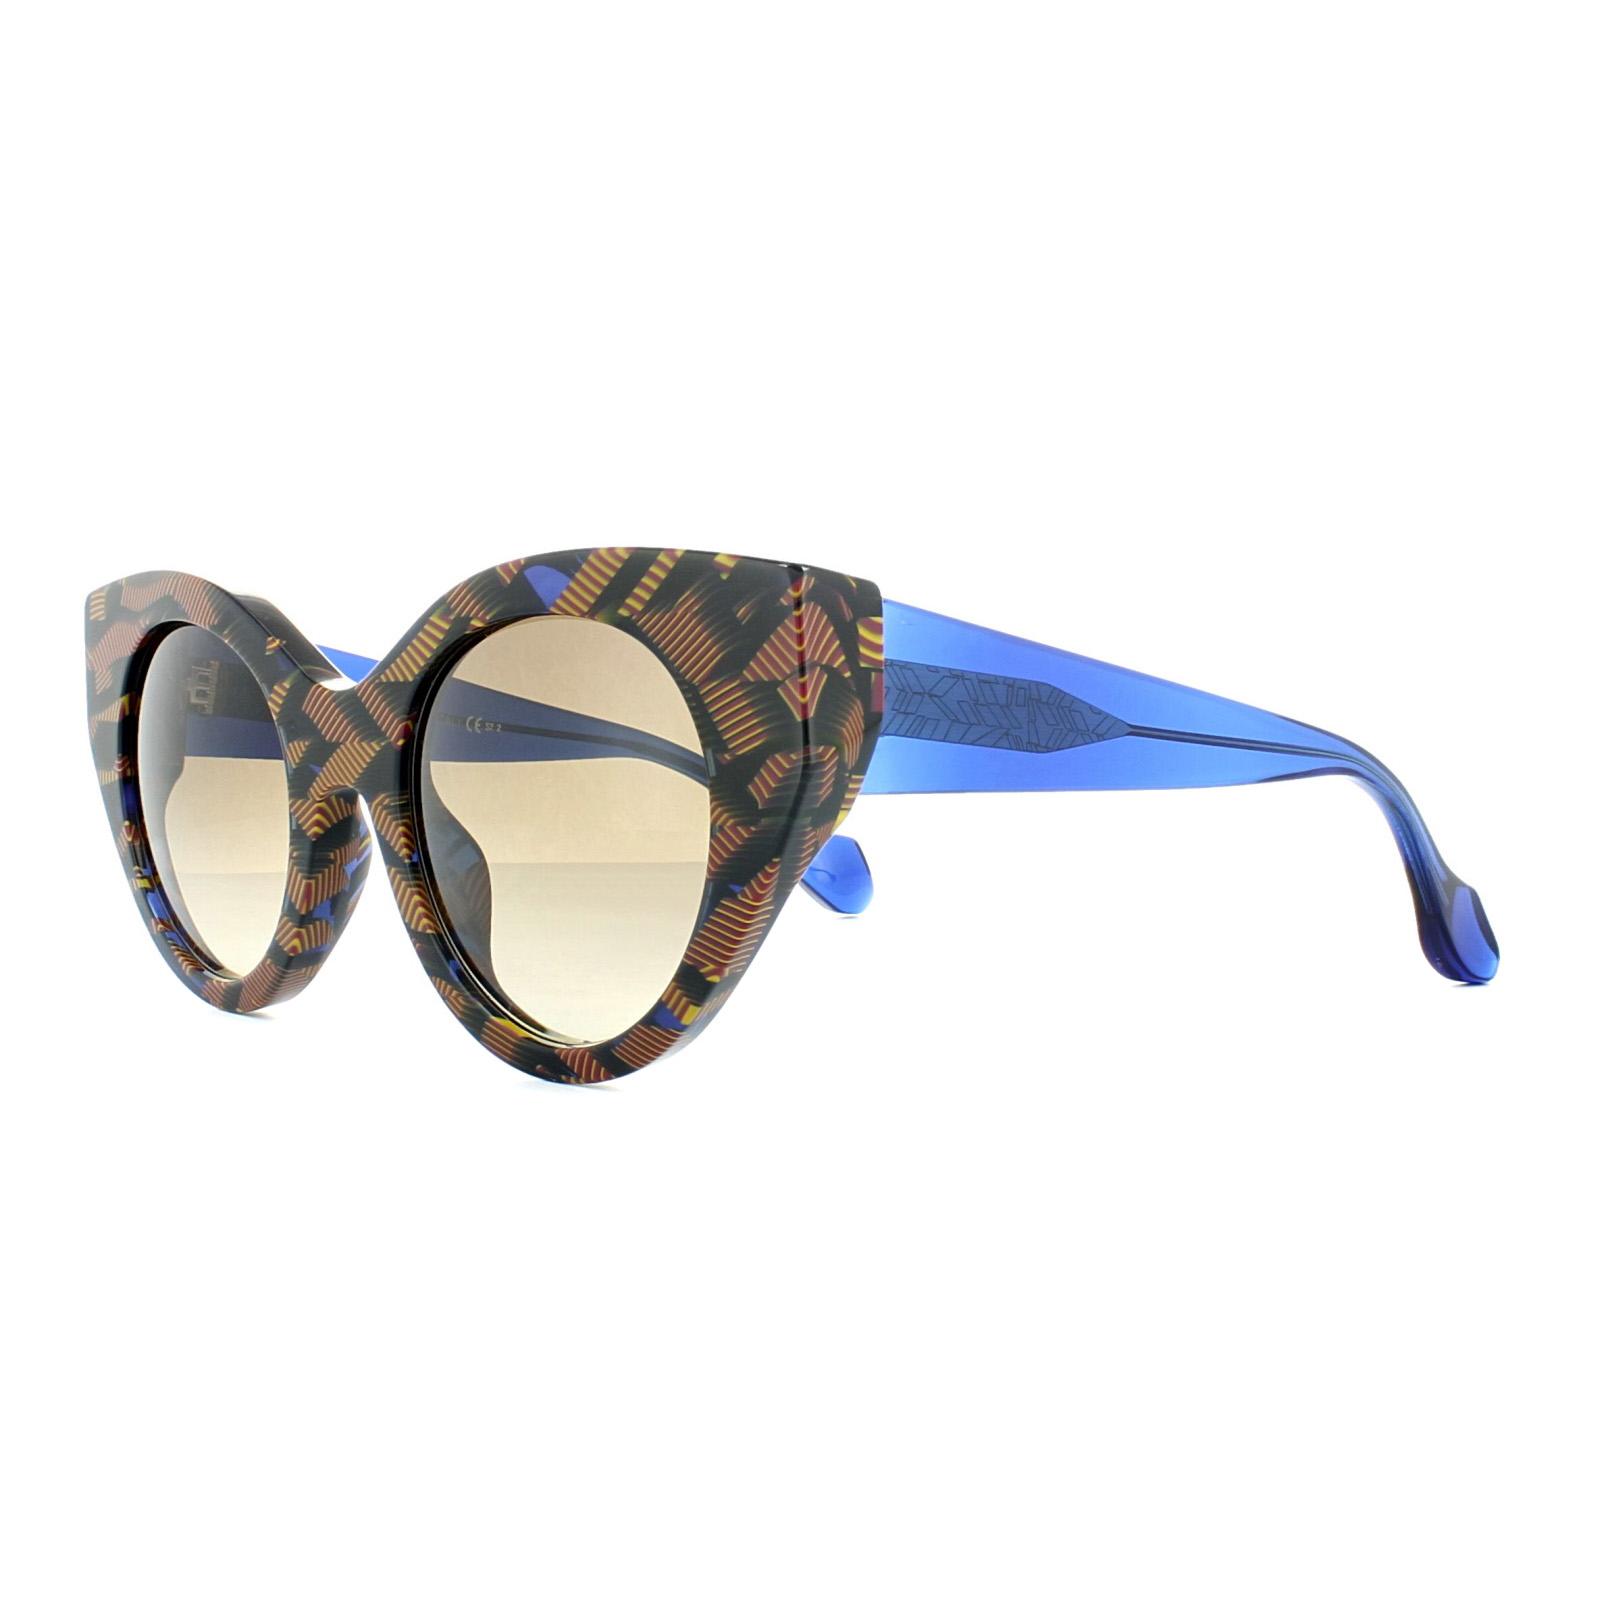 f47a1942b6841 Cheap Fendi Fanny 0105 S Sunglasses - Discounted Sunglasses